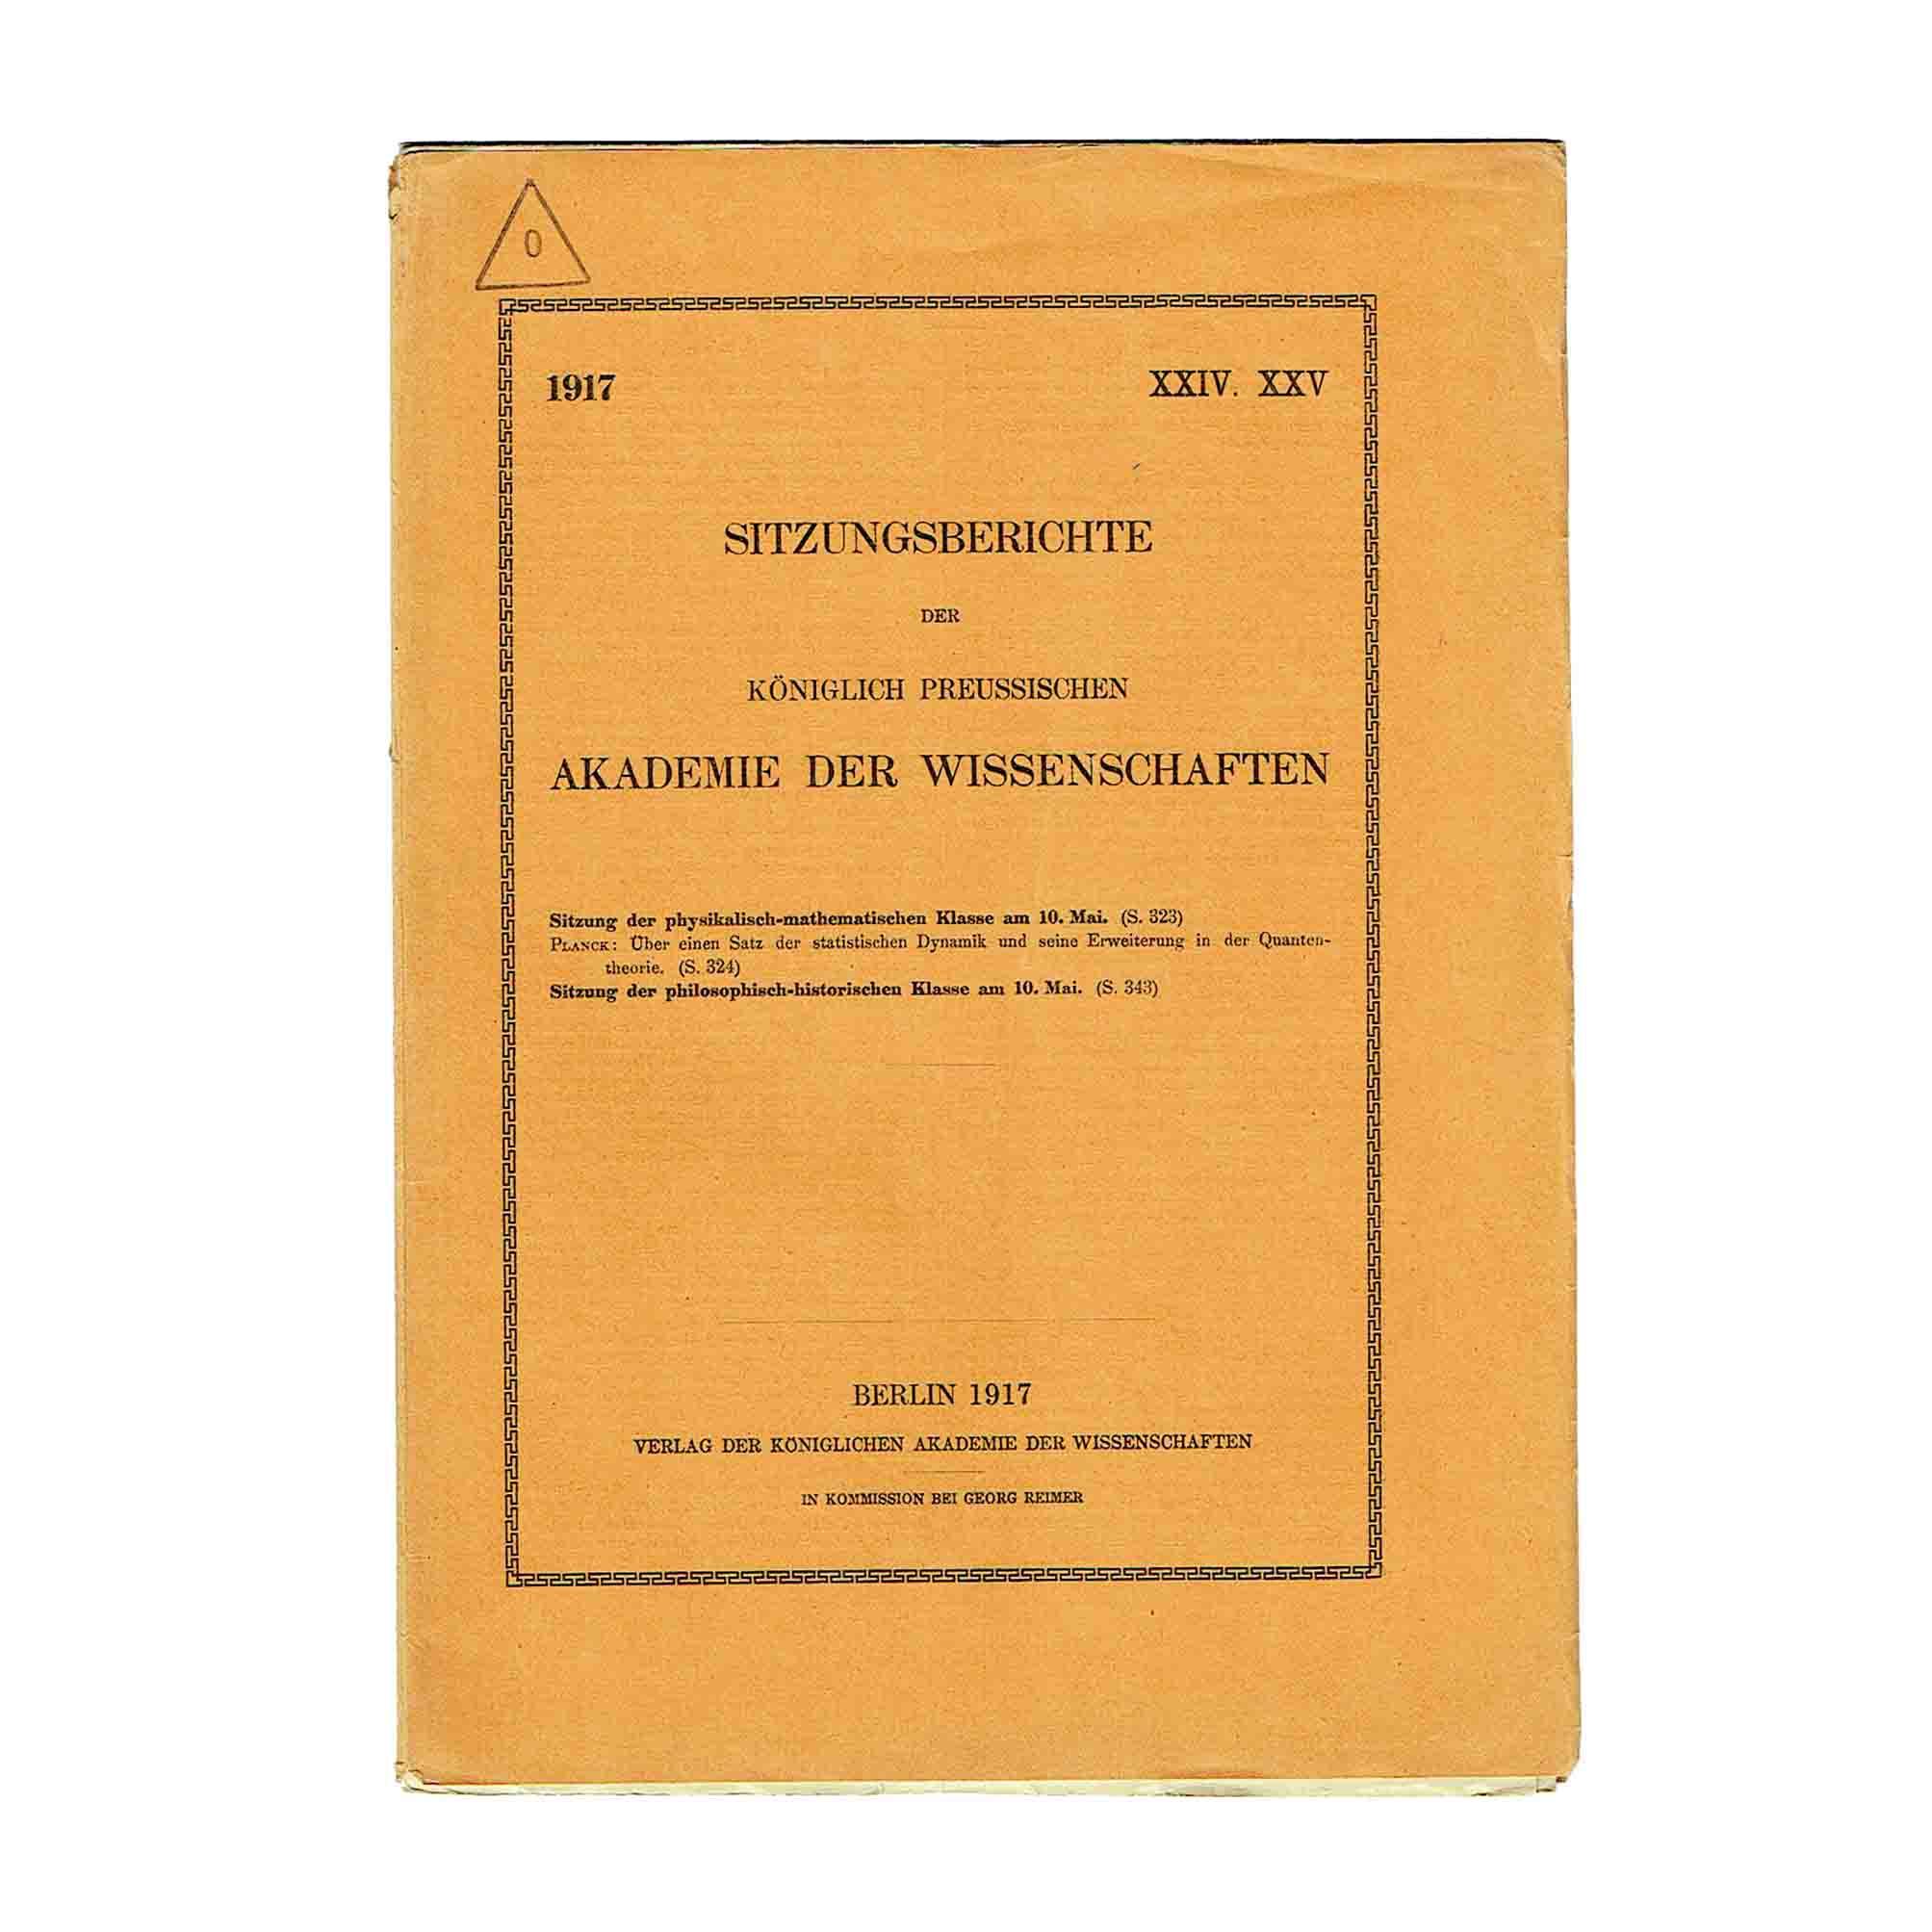 5812K-Planck-Satz-Dynamik-Quantentheorie-1917-Cover-recto-A-N.jpeg